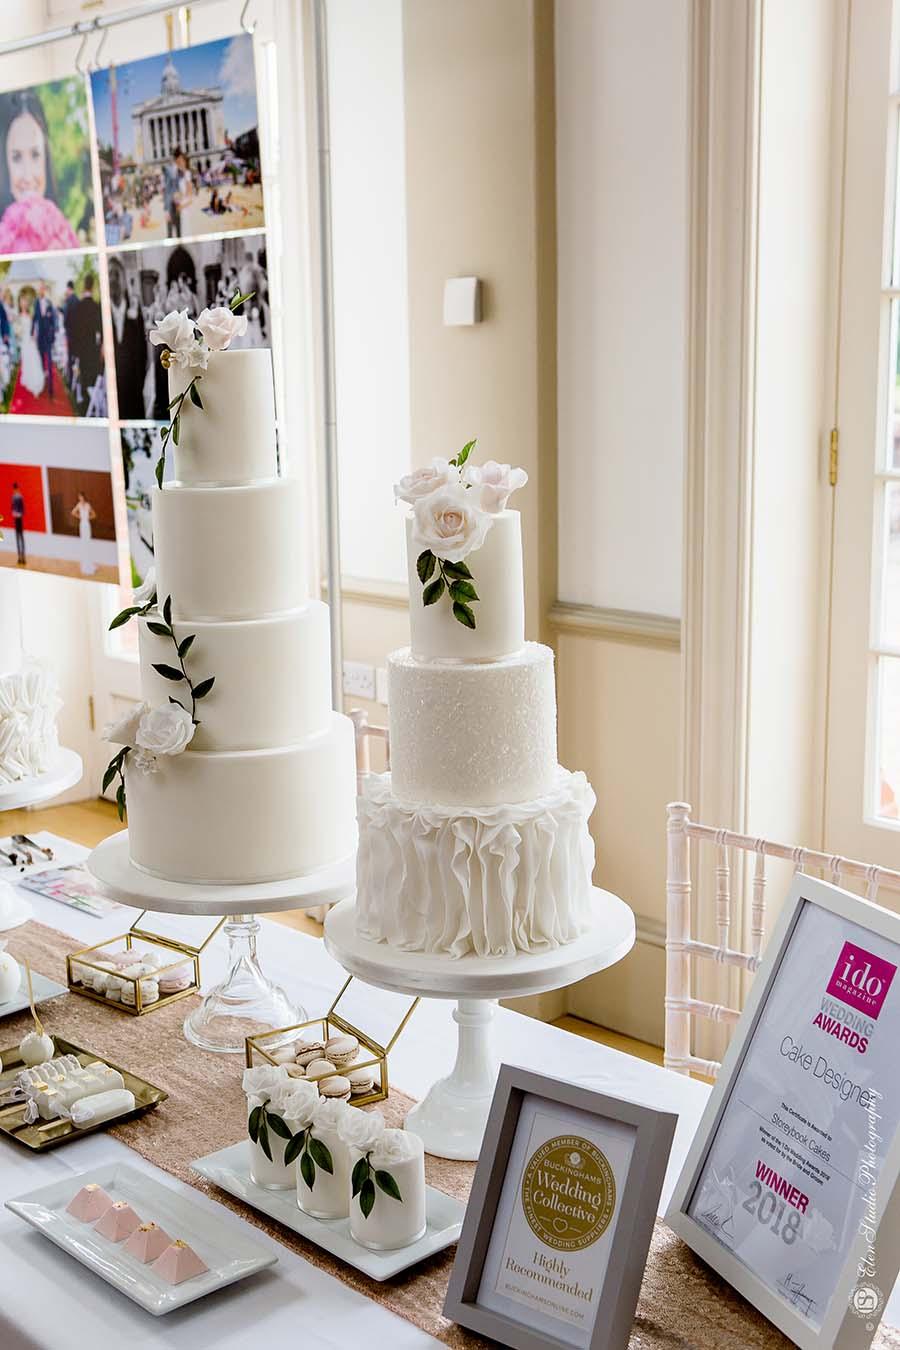 Hodsock-priory-wedding-fair-Elen-Studio-Photography-034